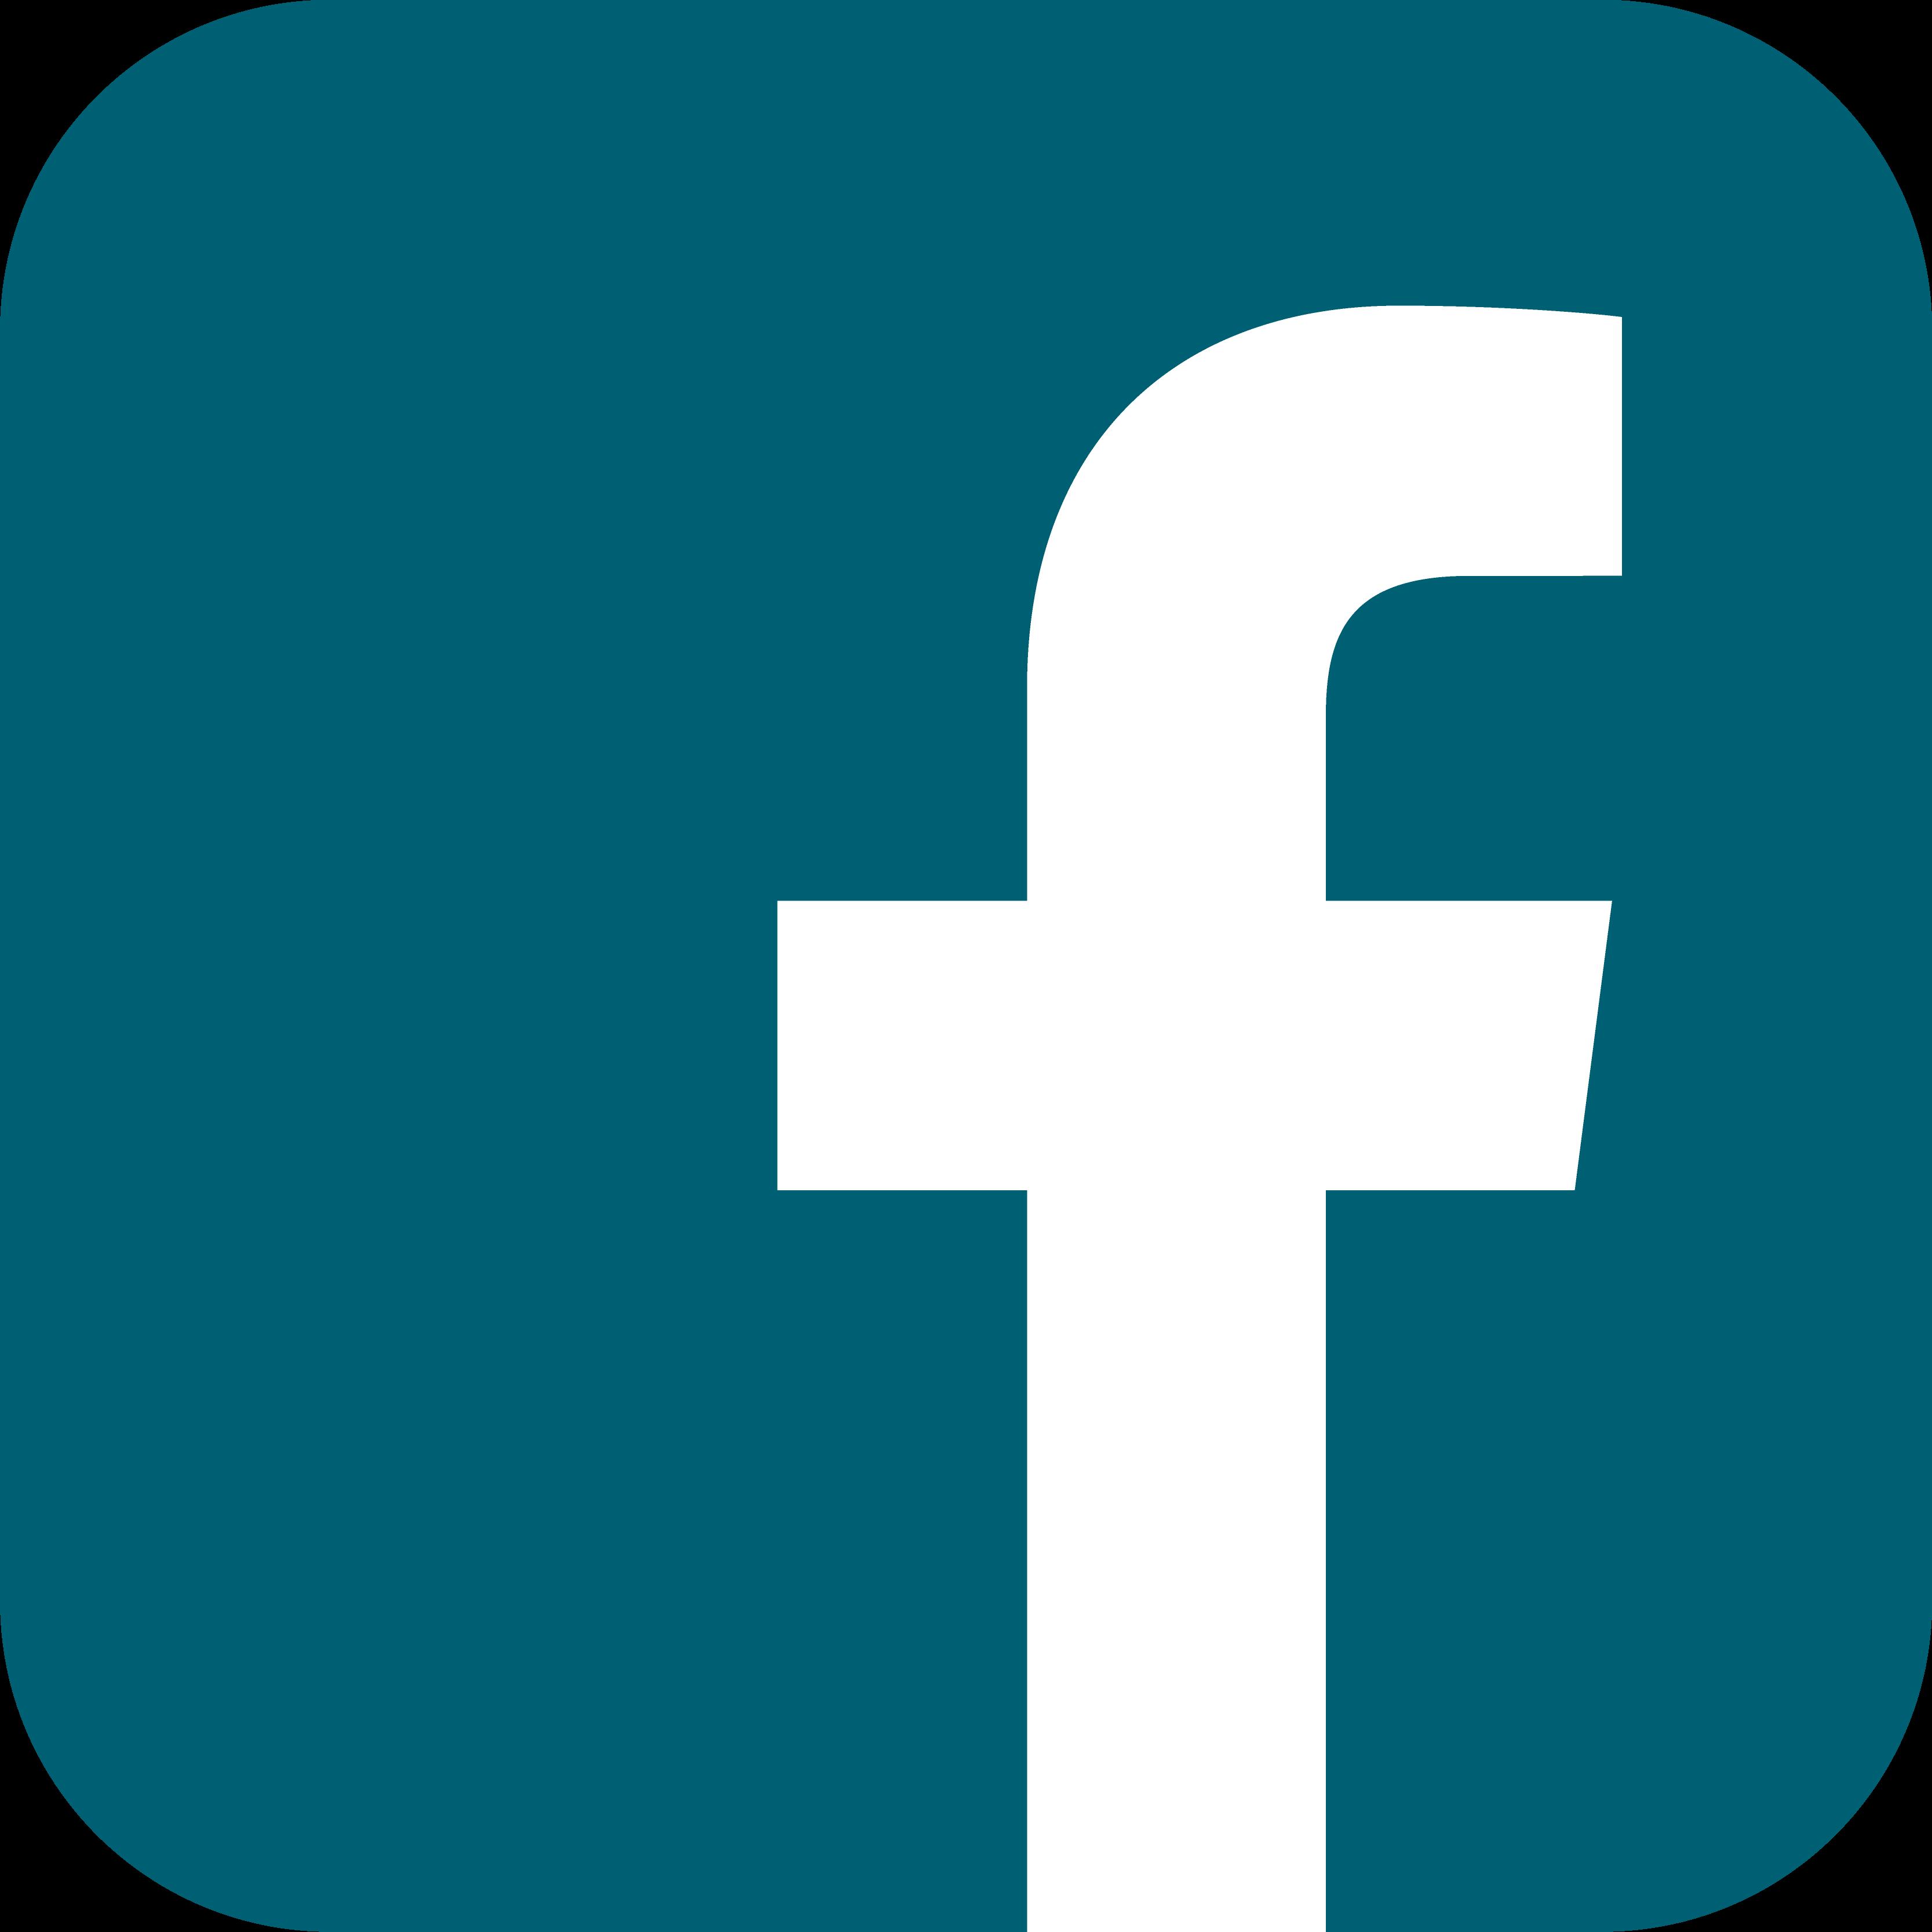 https://www.facebook.com/hebrombeneficios